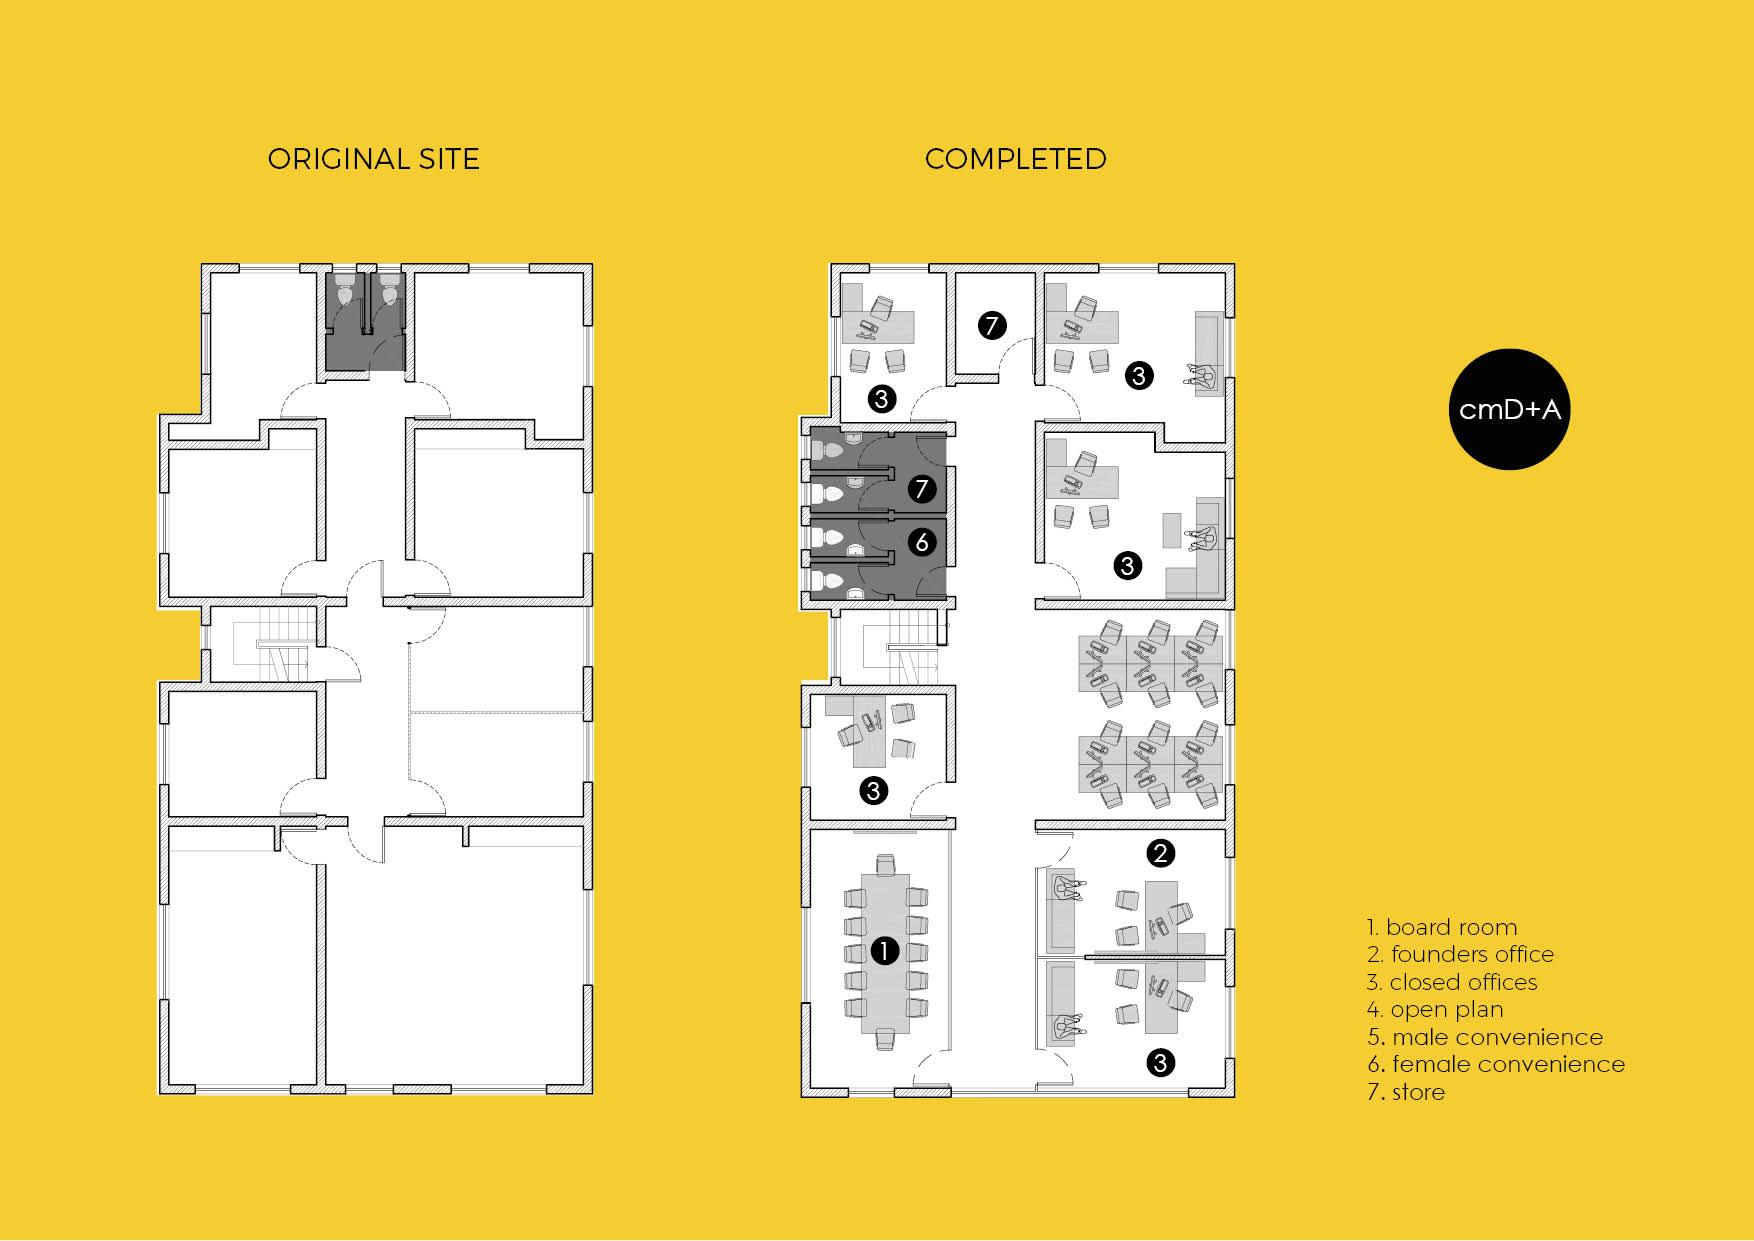 clane_13_cmD+A office retrofit13